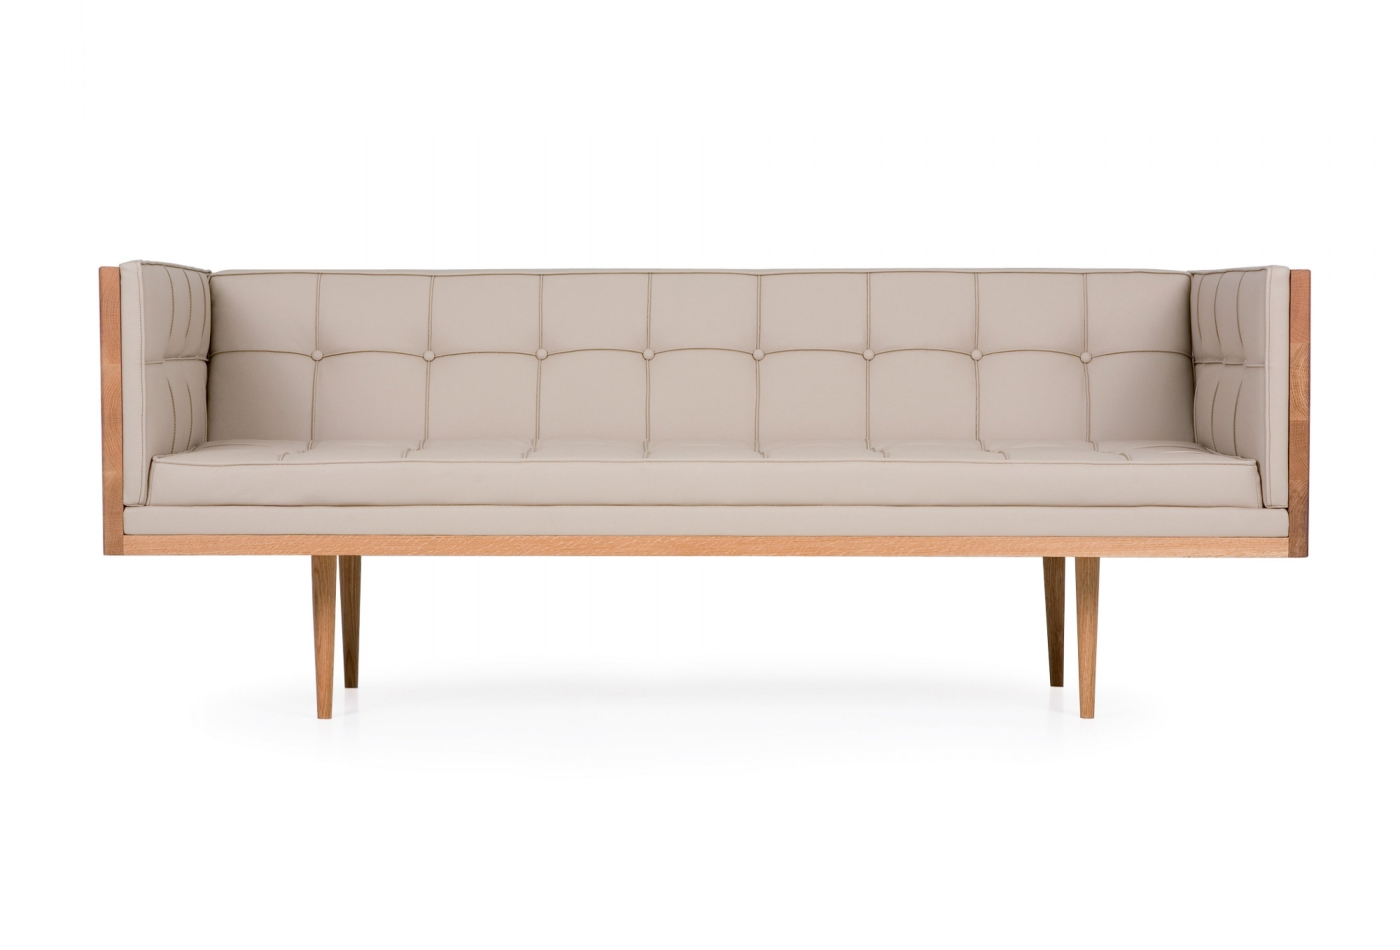 Box Sofa By Autoban Sohomod Blog